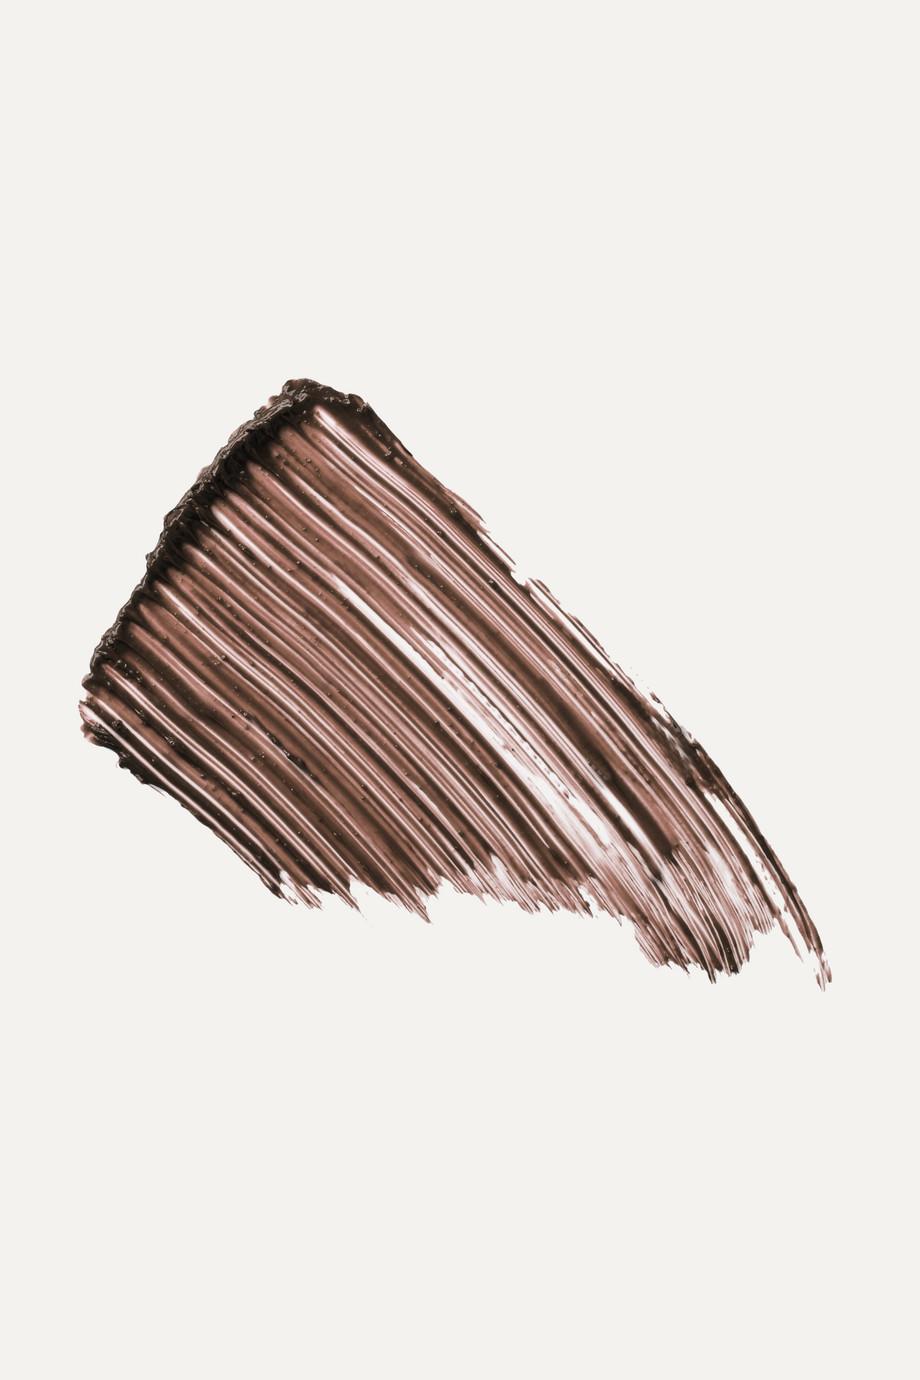 Sisley So Curl Mascara - 2 Deep Brown